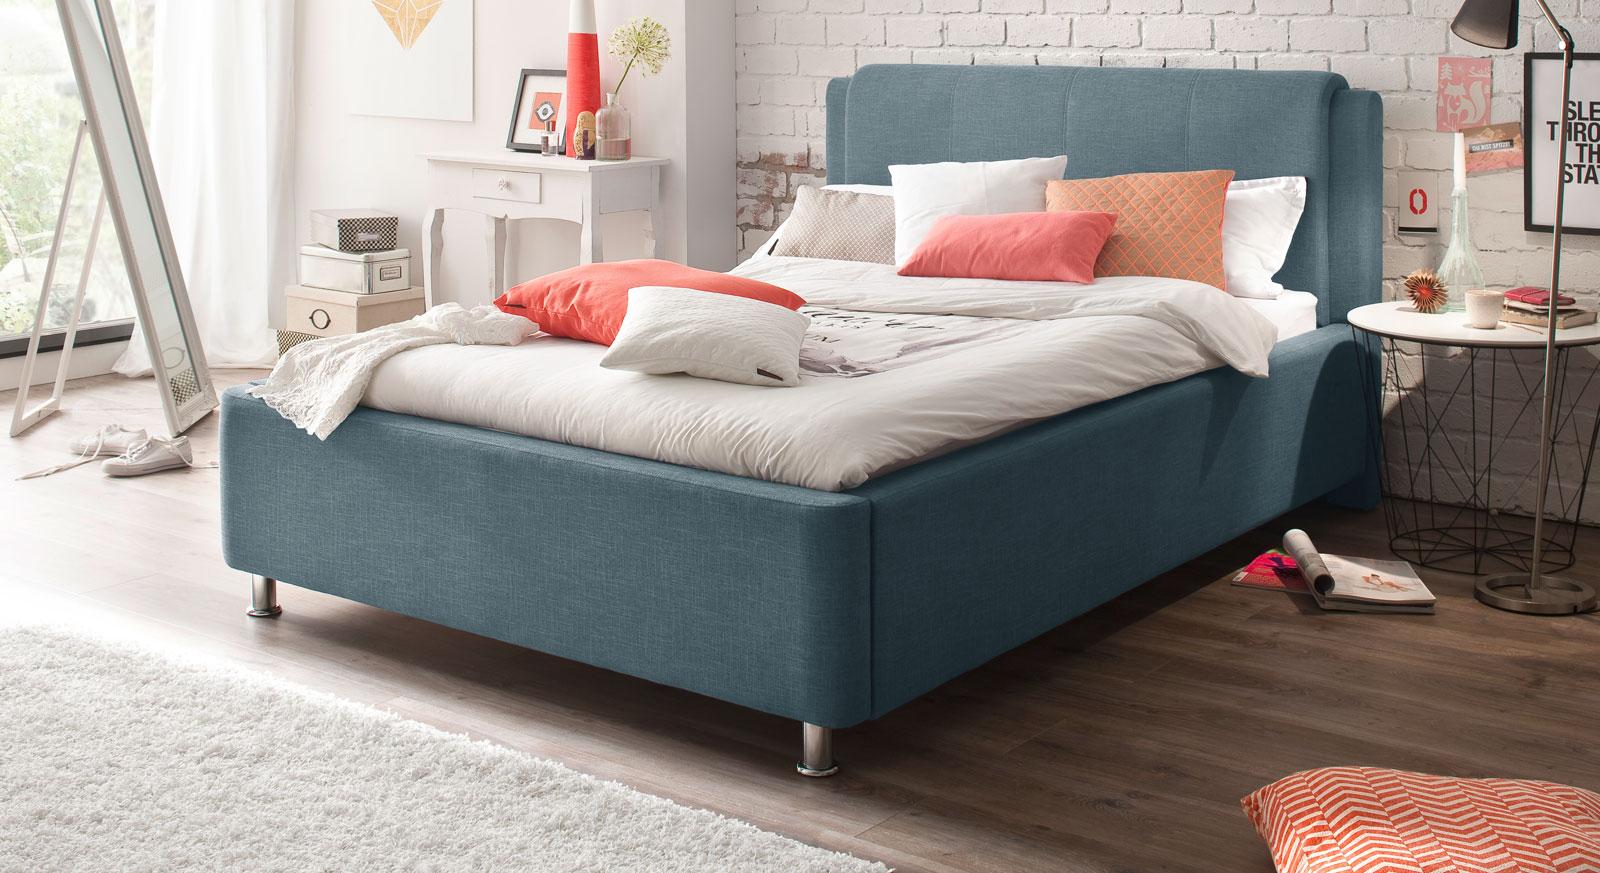 Blaues Bett La Marsa mit 140 cm Bettbreite